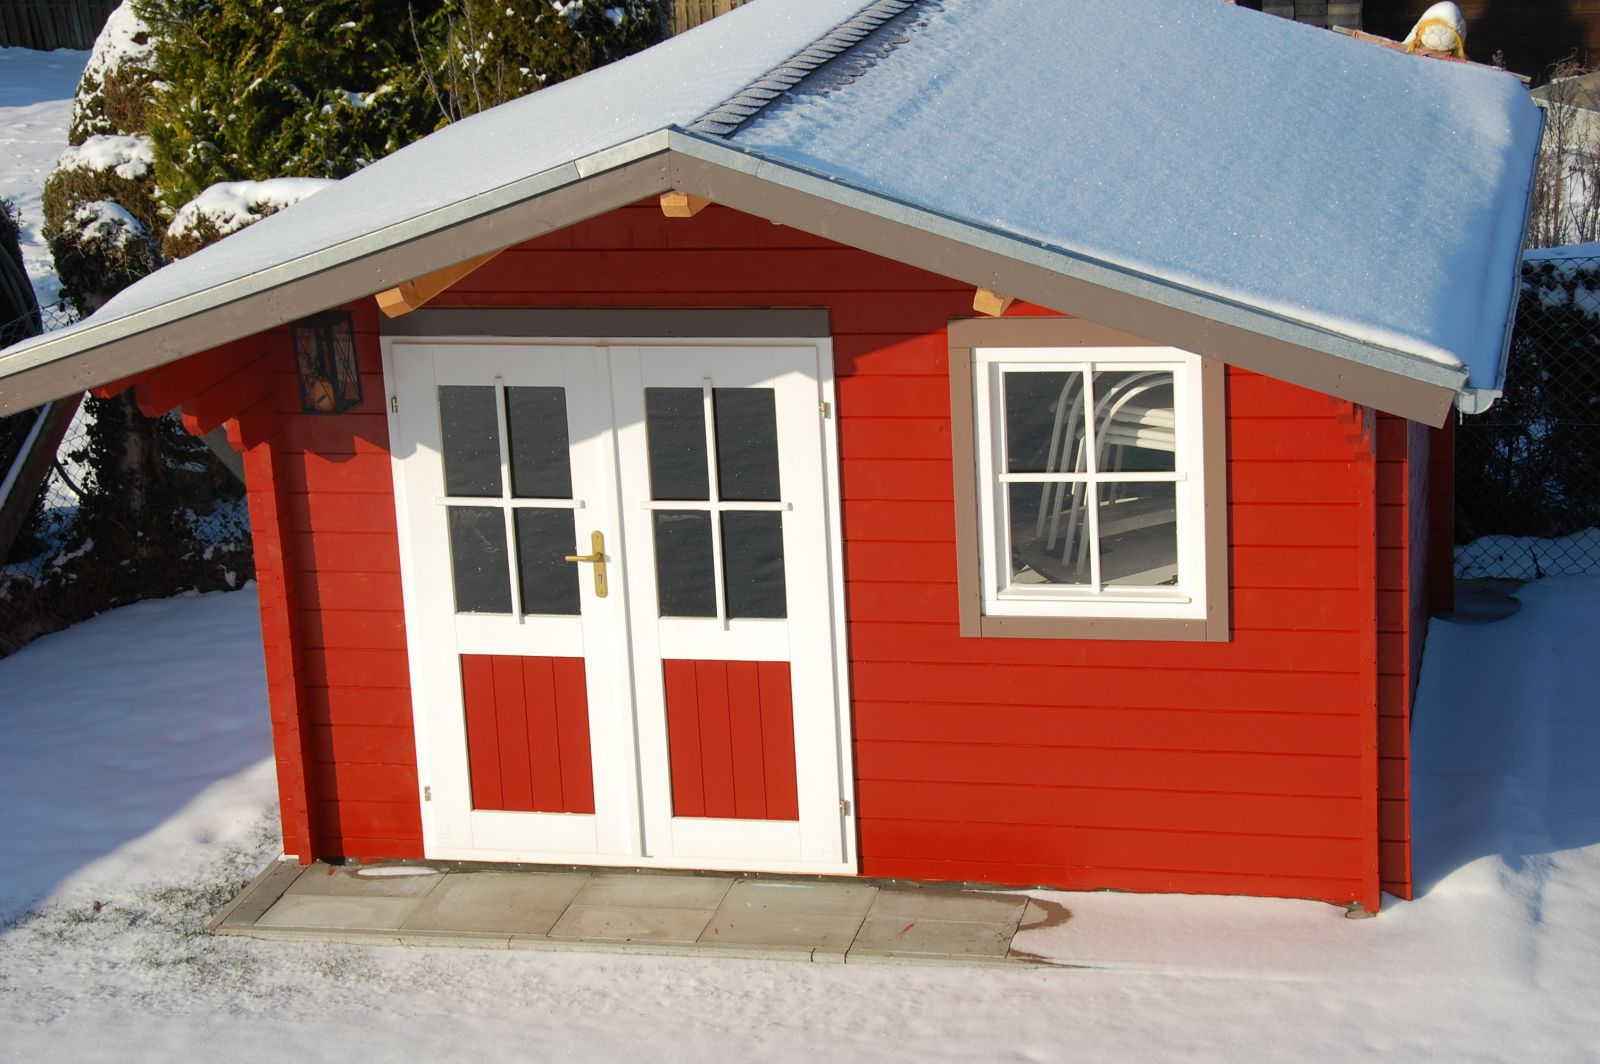 gartenhaus dach nornabaeli. Black Bedroom Furniture Sets. Home Design Ideas